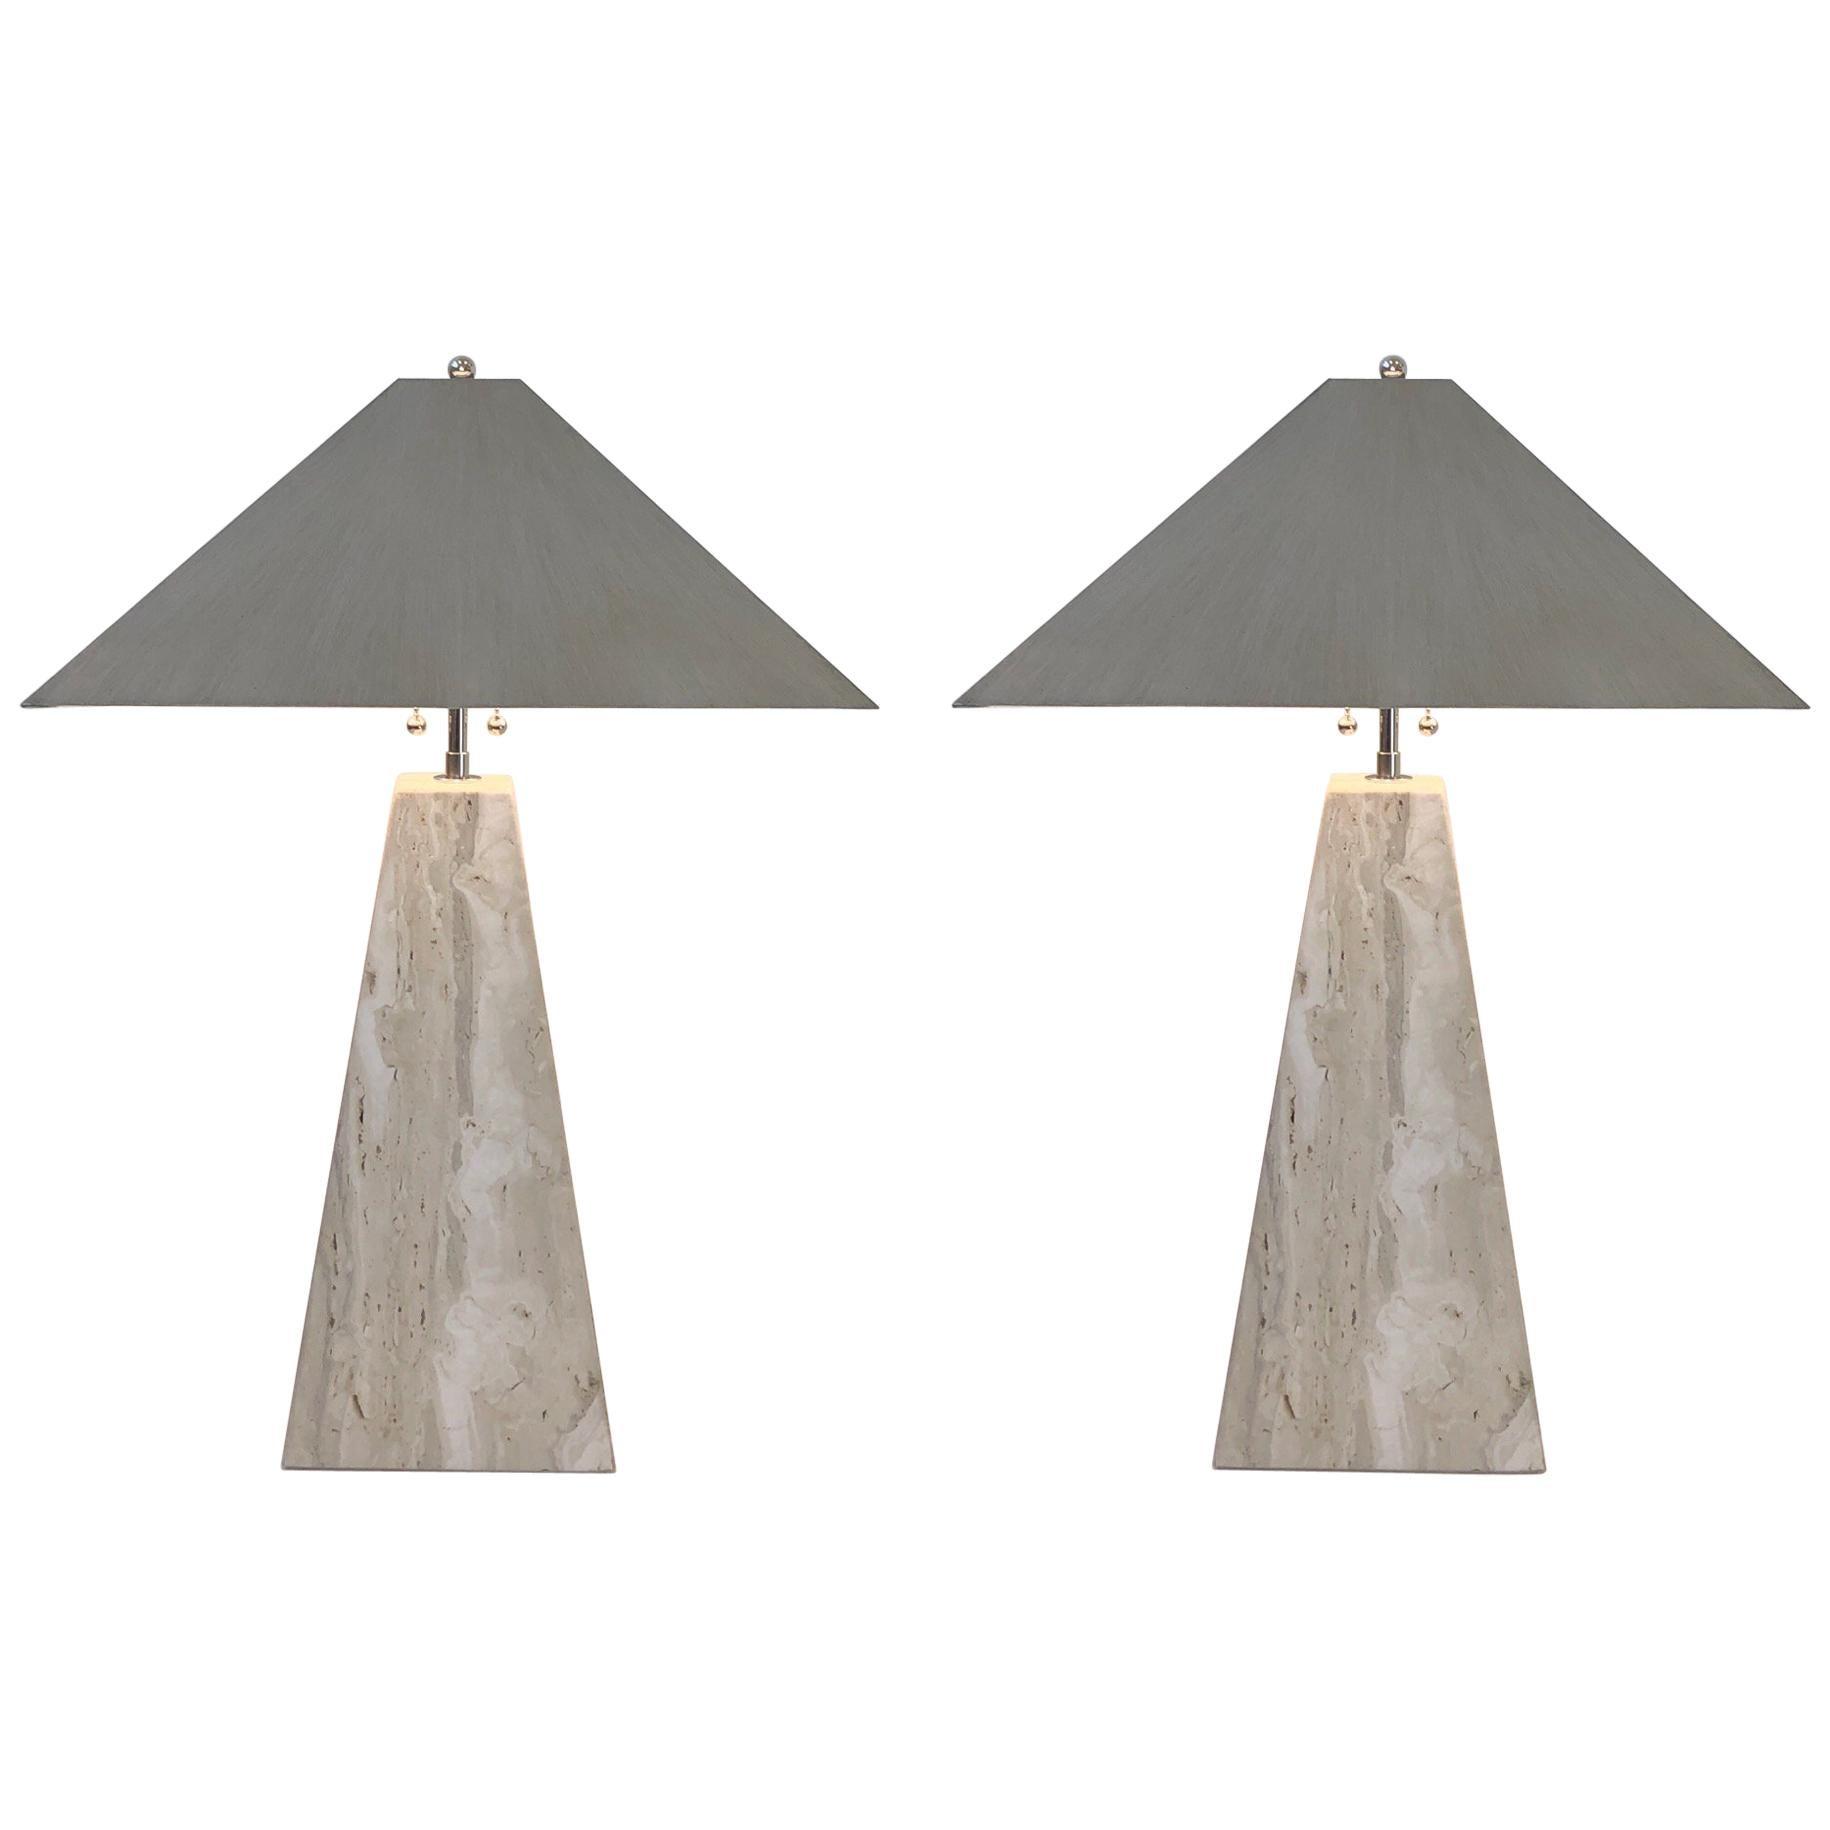 Pair of Italian Travertine and Polish Nickel Obelisk Shape Table Lamps